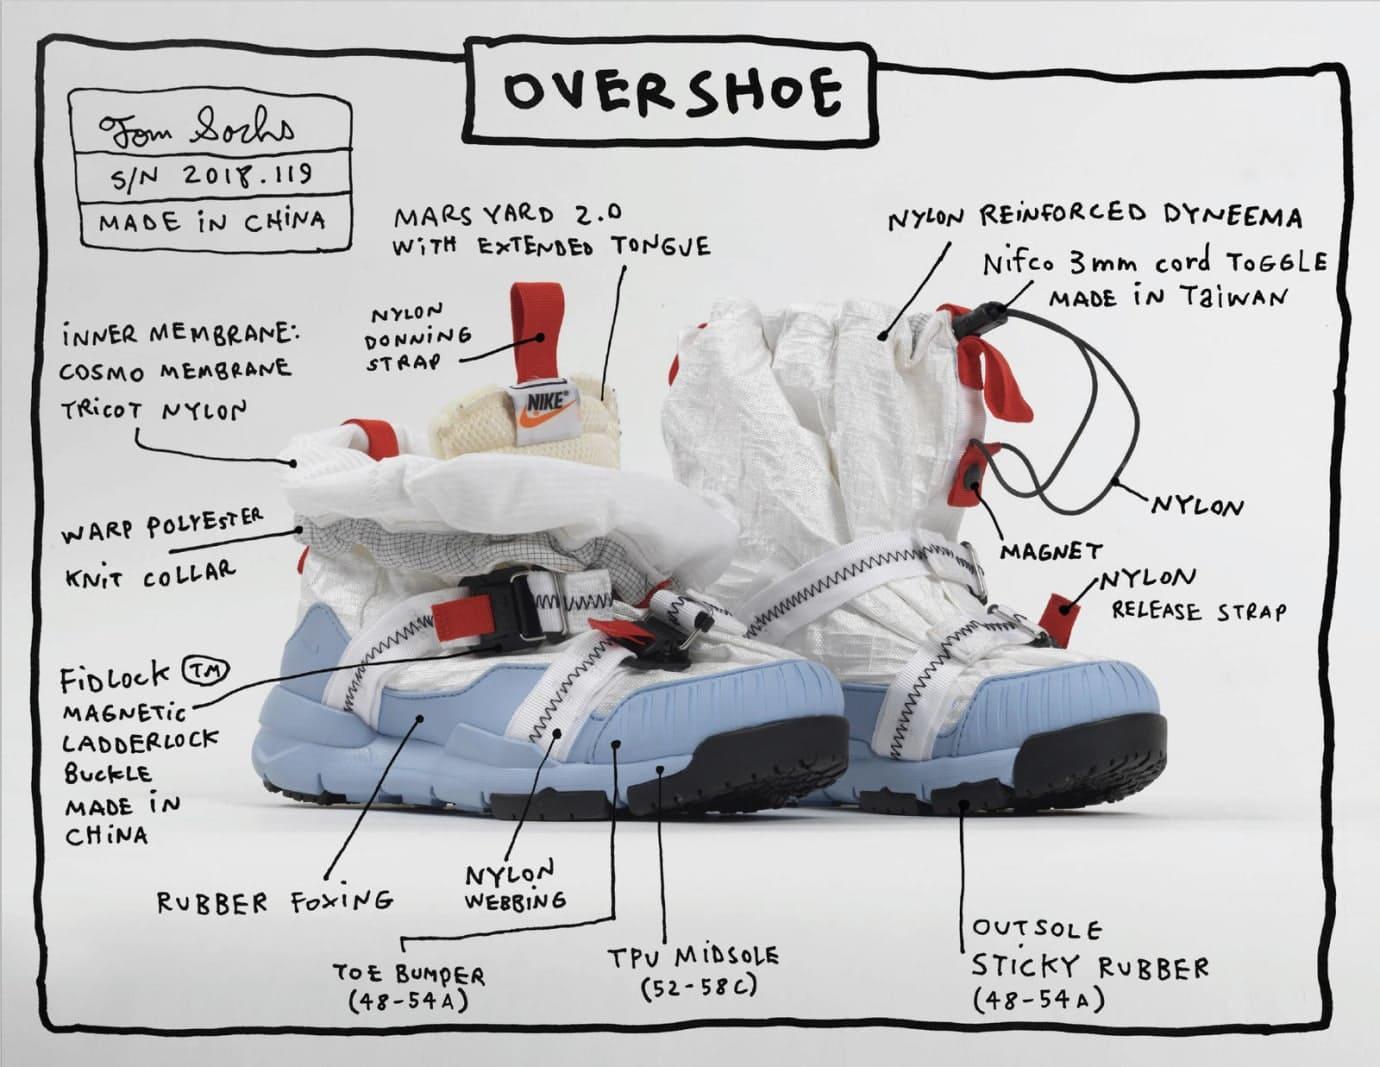 tom-sachs-nike-mars-yard-overshoe-04